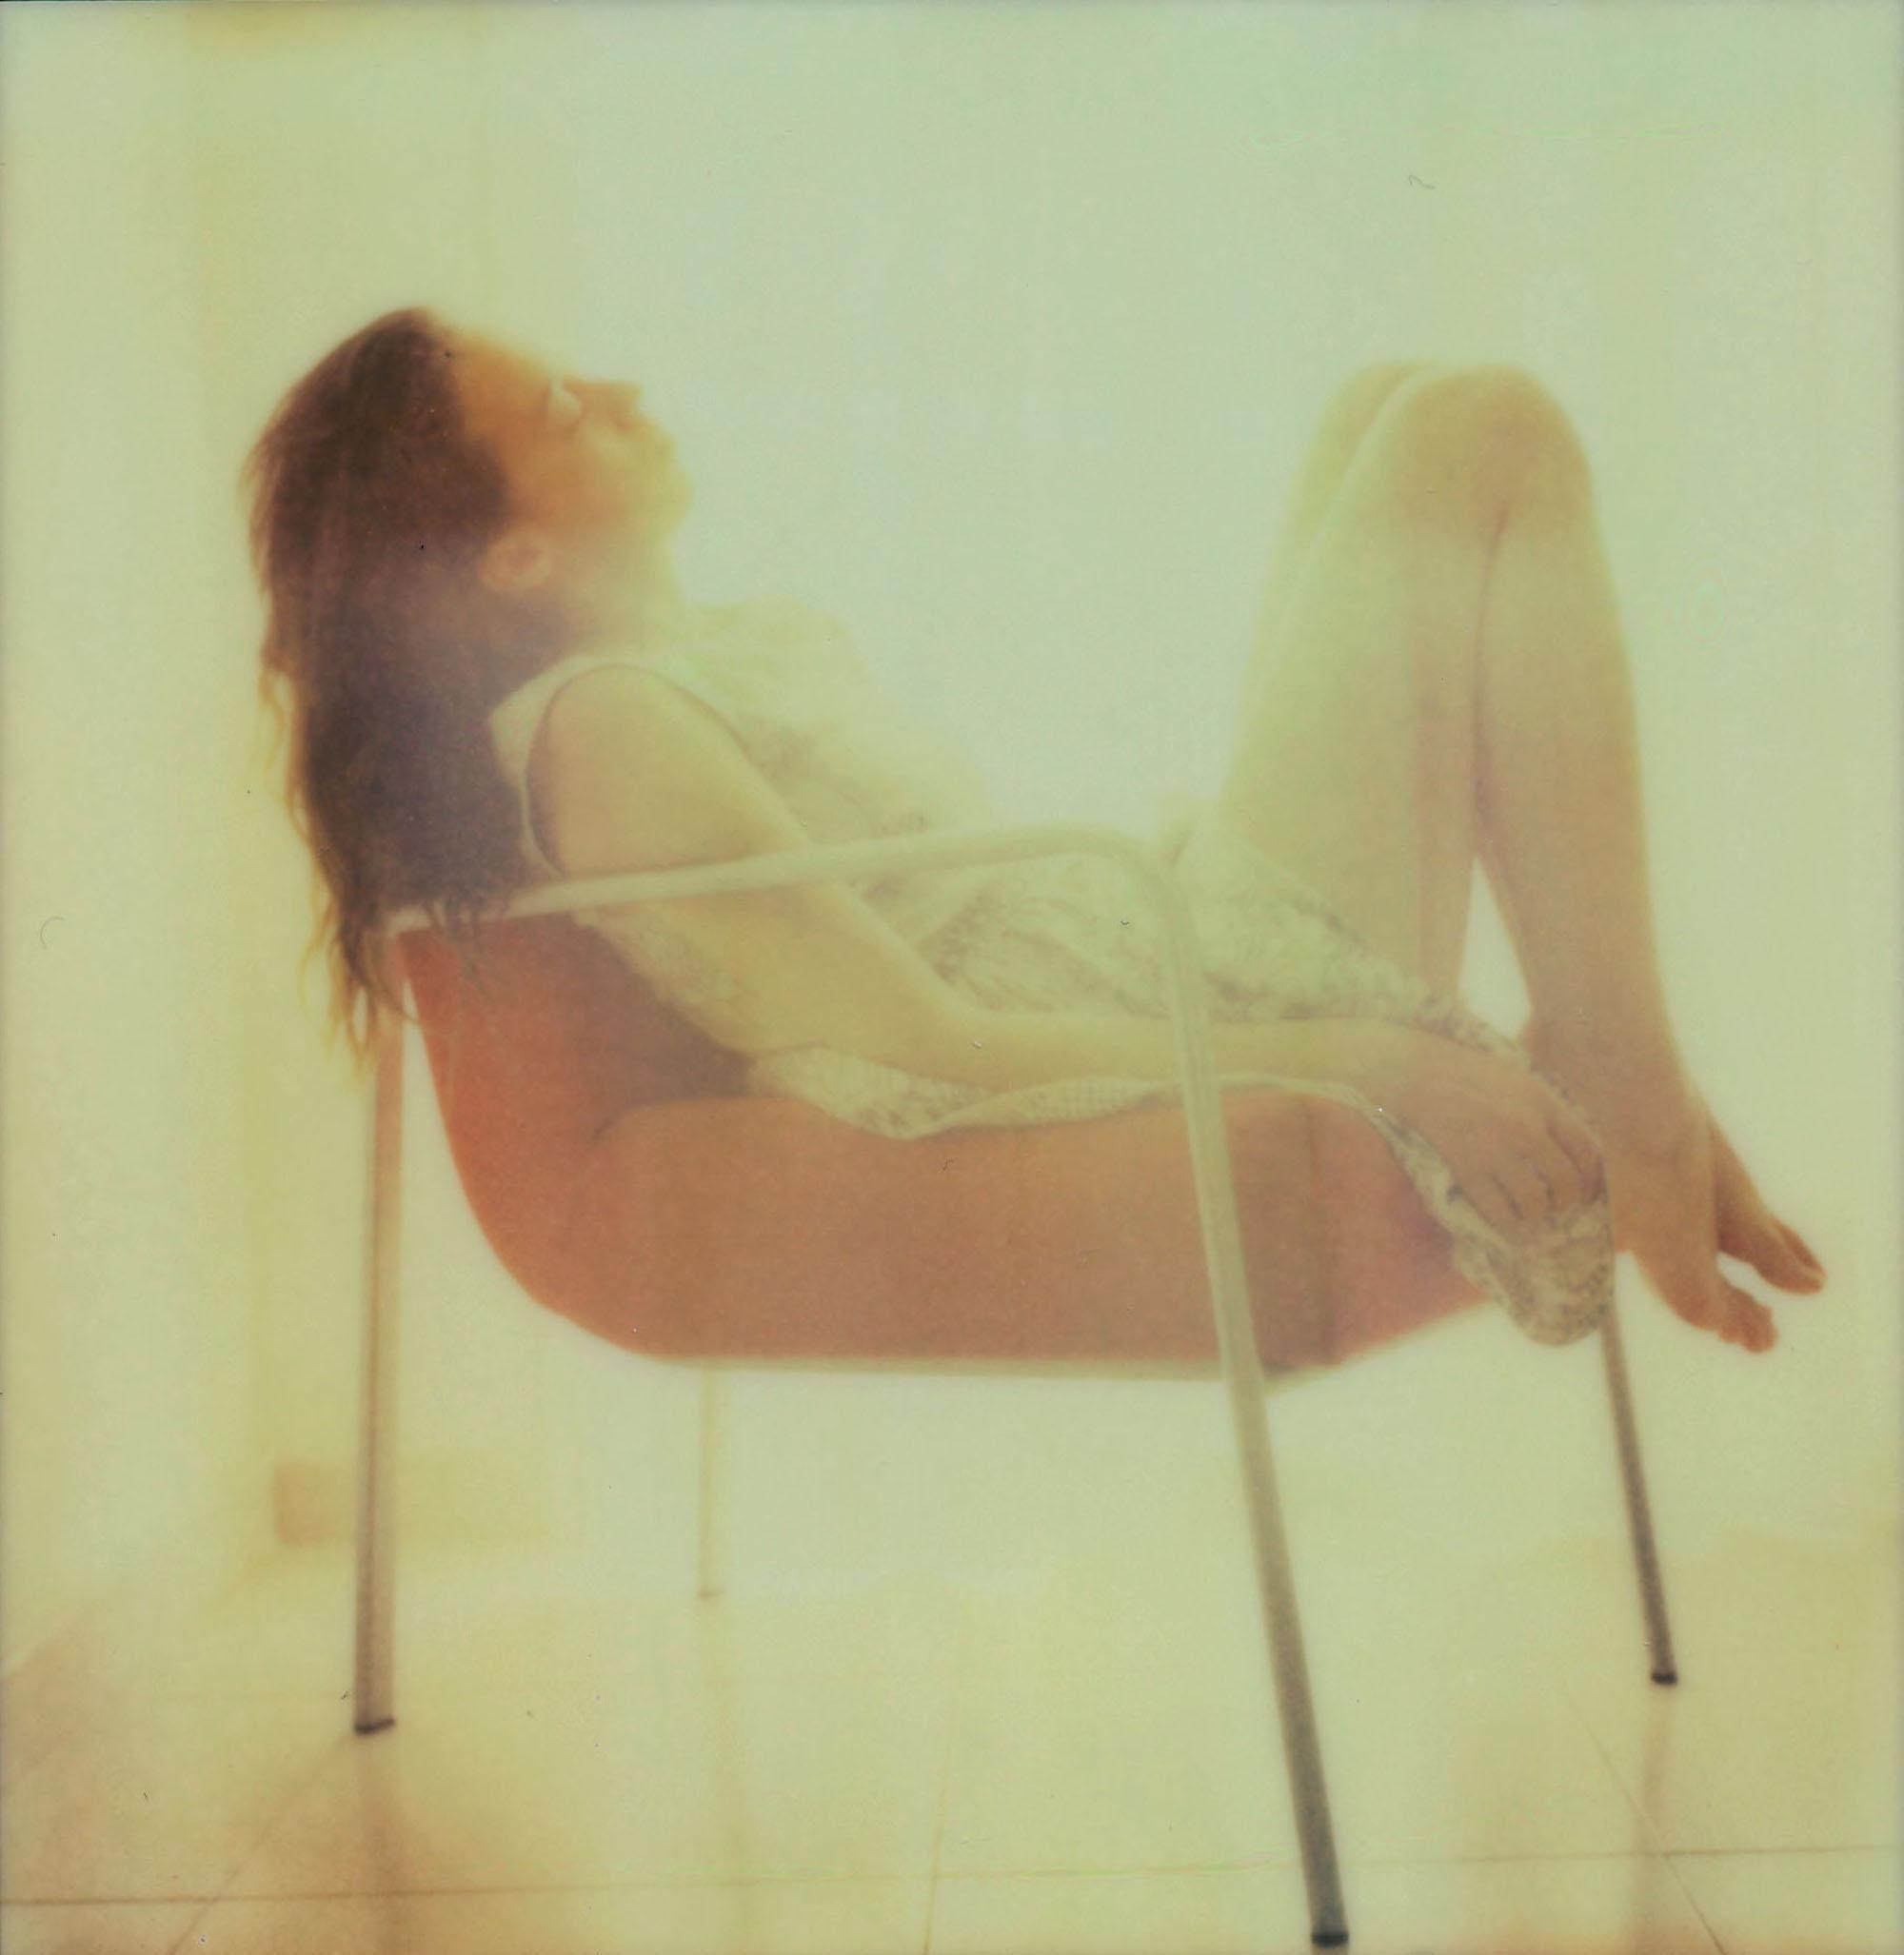 Self-Portrait II - Mounted, Contemporary, Polaroid, Color, Portrait